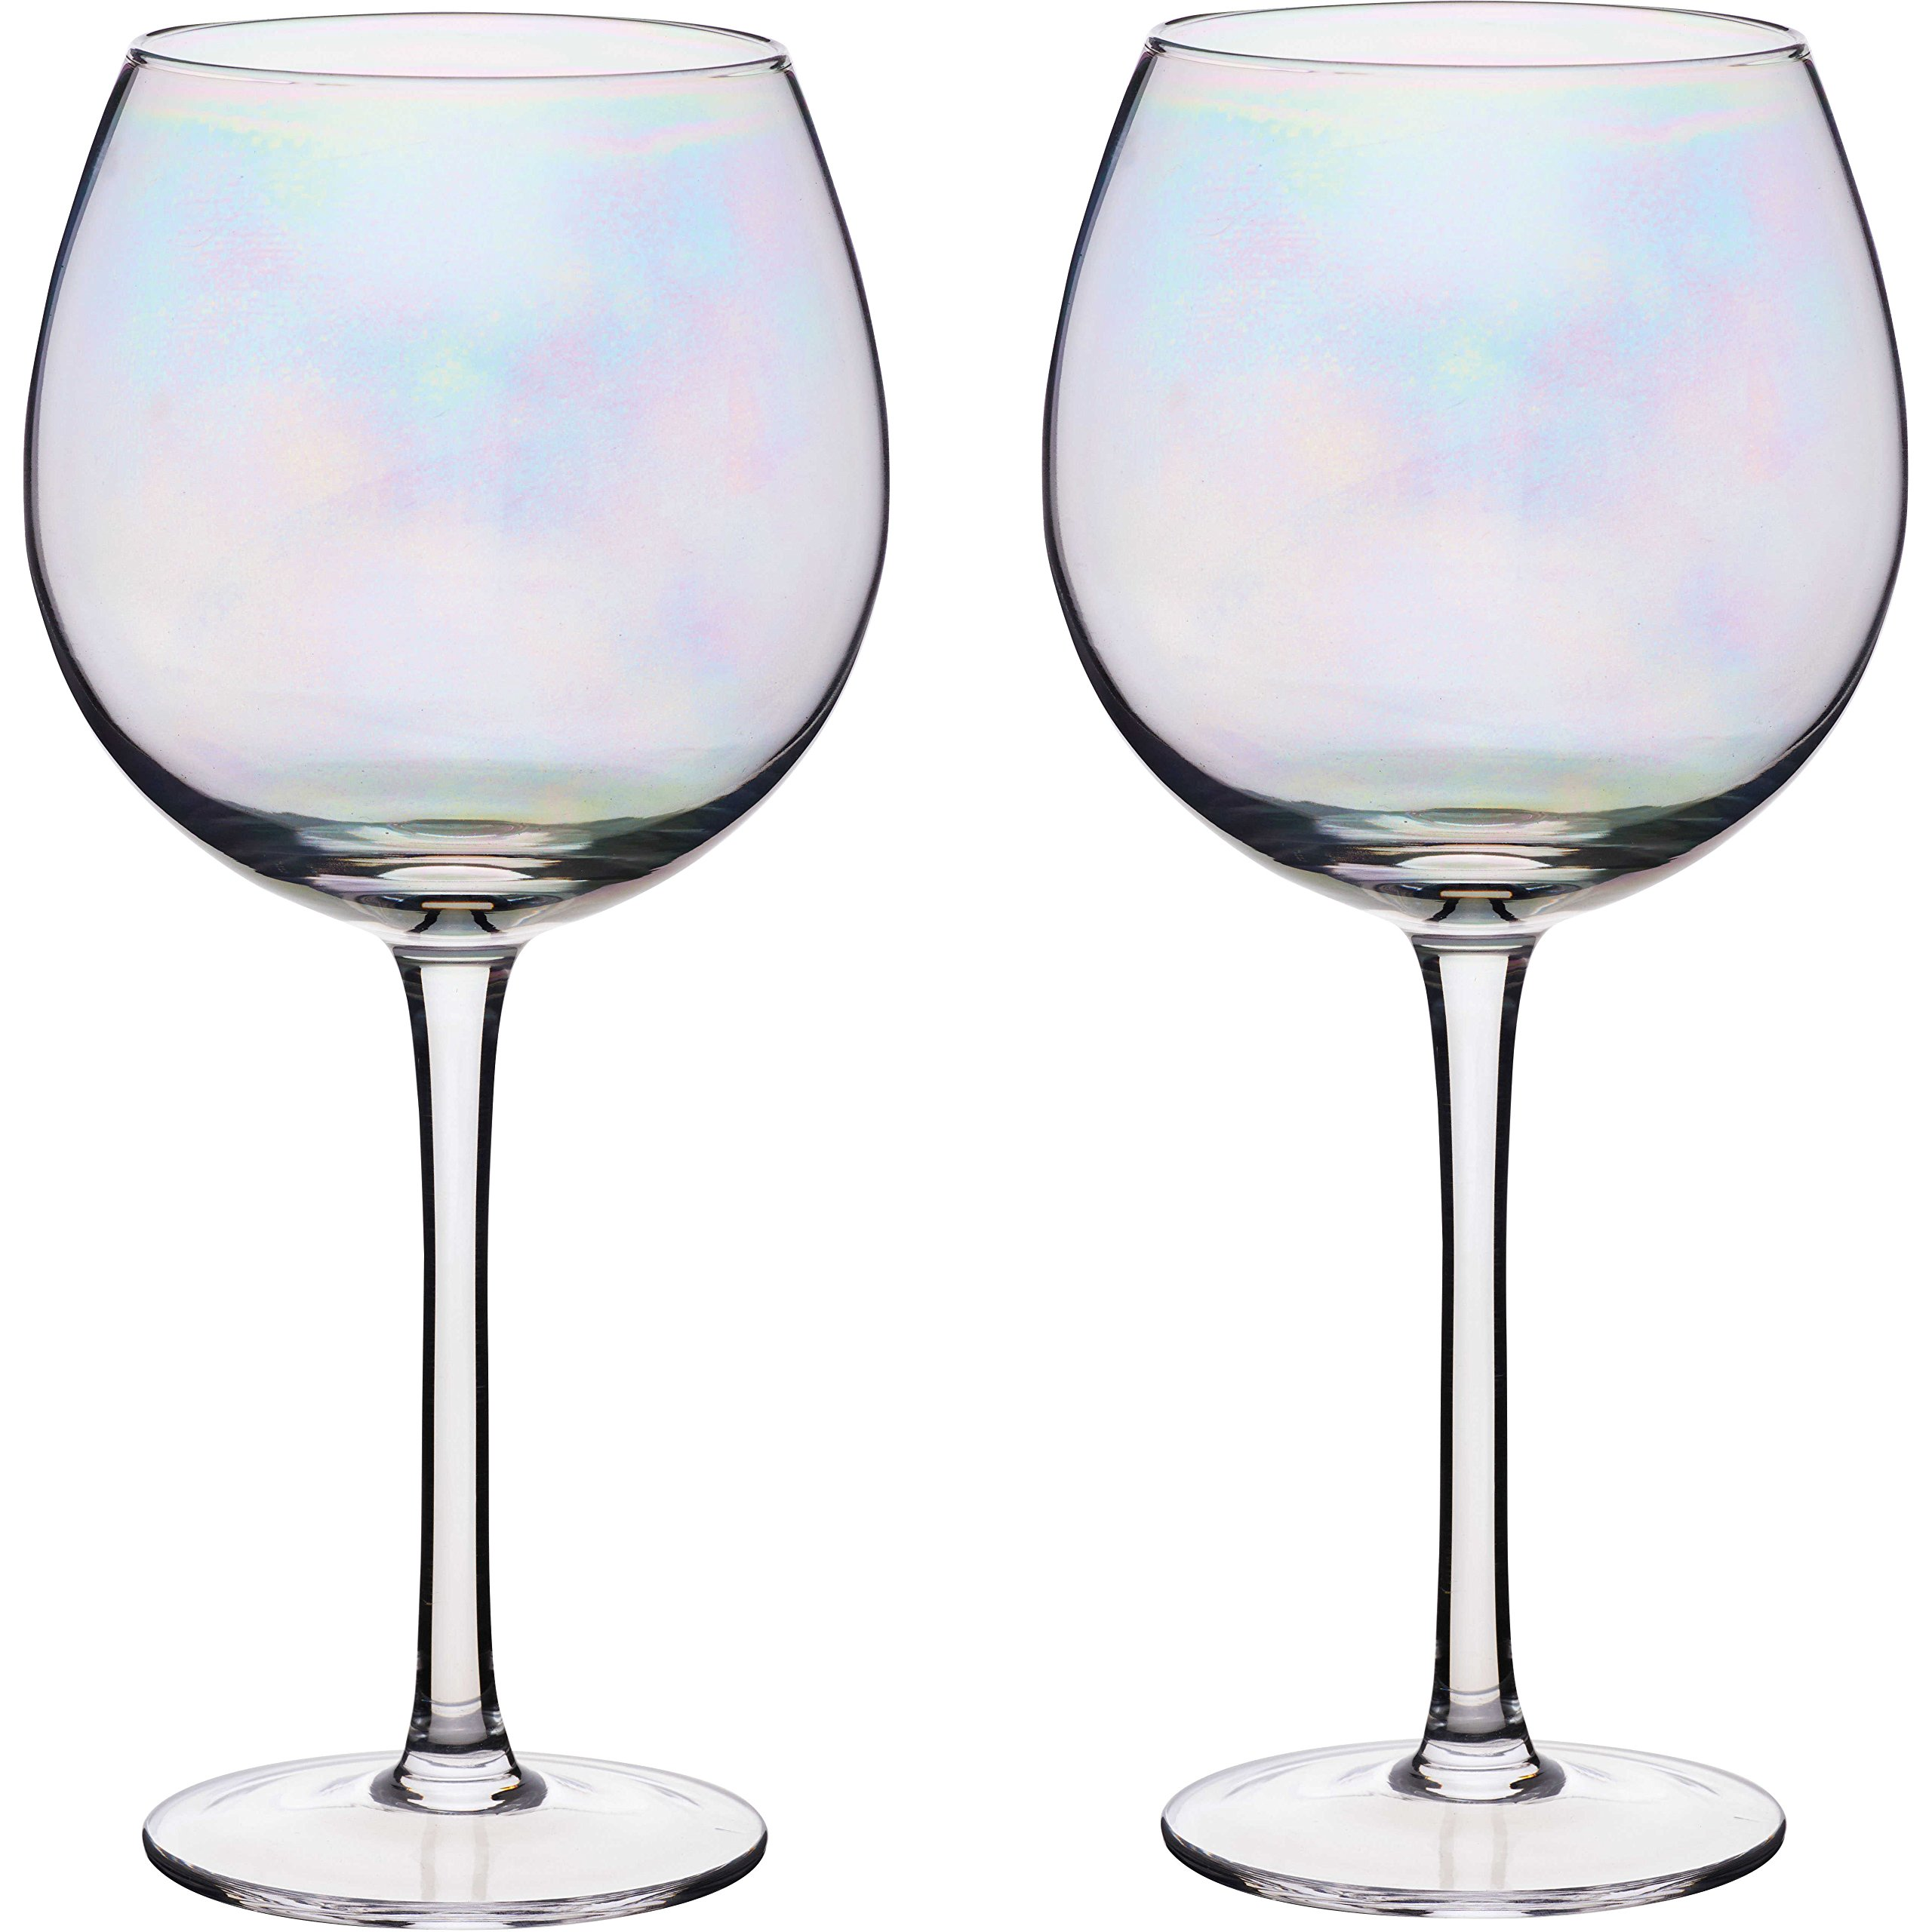 Kitchen Craft BarCraft Iridescent Lustre Rainbow Gin Glasses Glass Set of 2 500ml 16.9fl oz